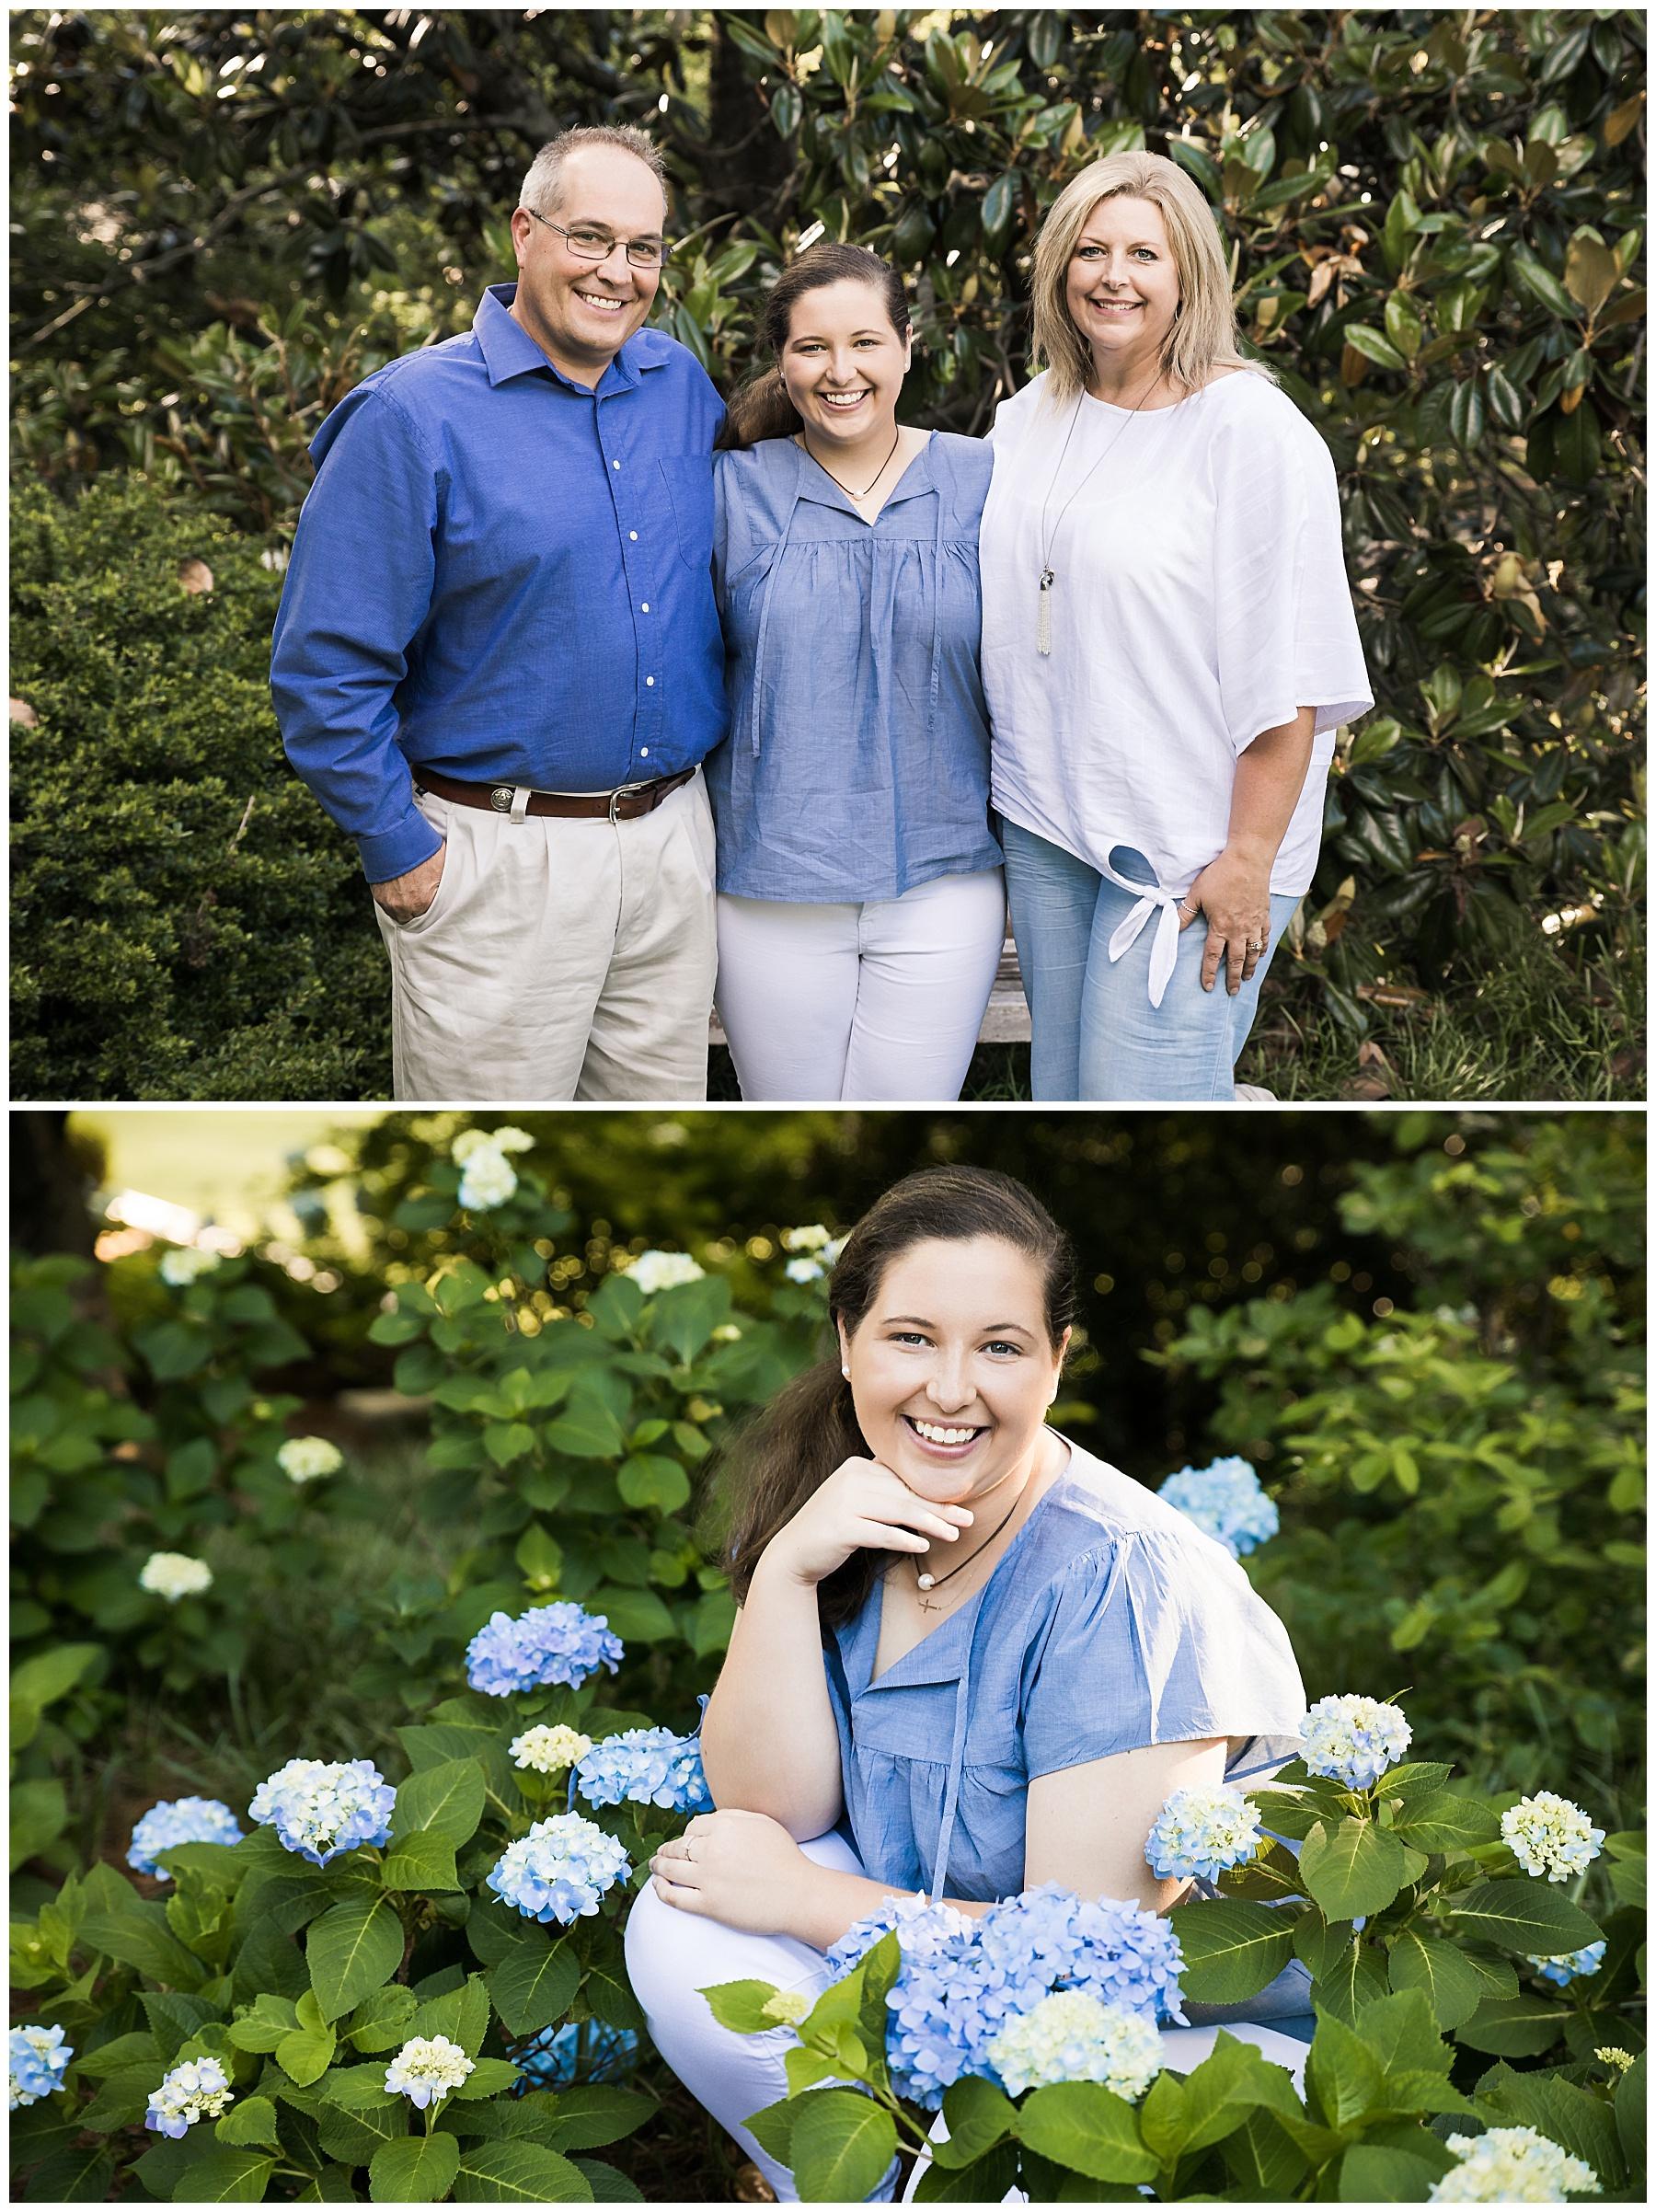 auburn arboretum family portraits lbeesleyphoto